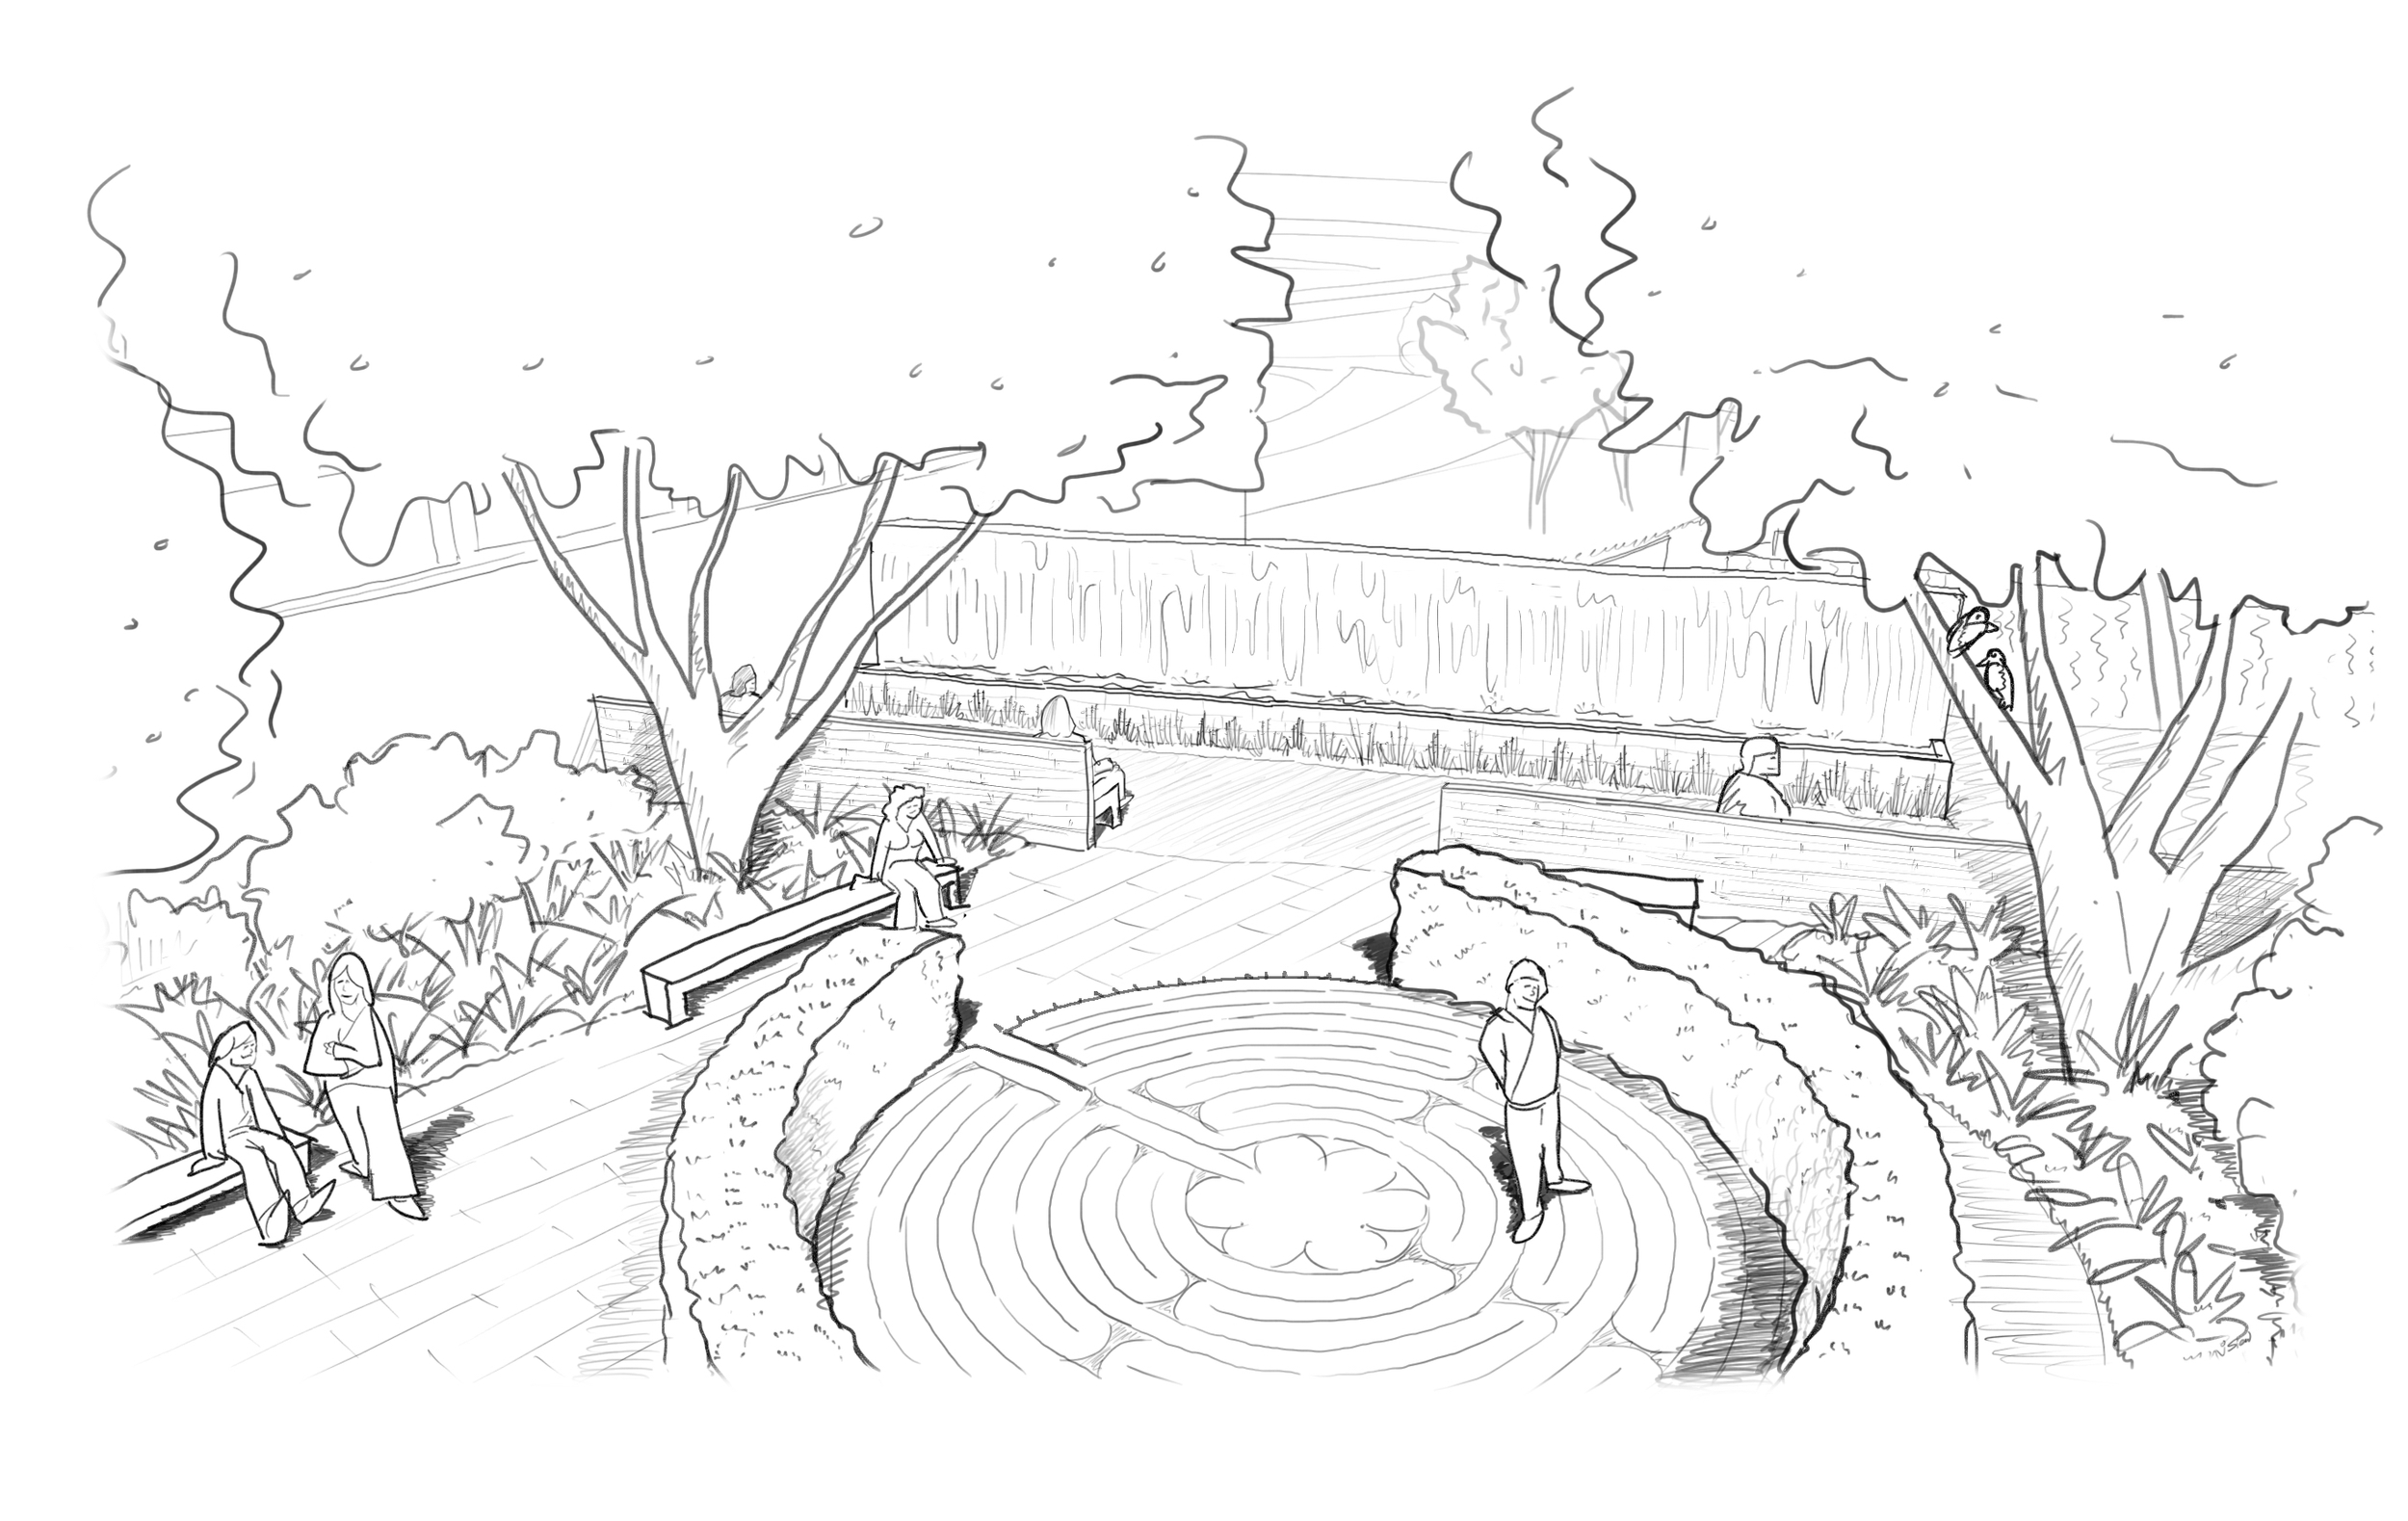 Sketch_04_WaterWall_Labirynth.jpg